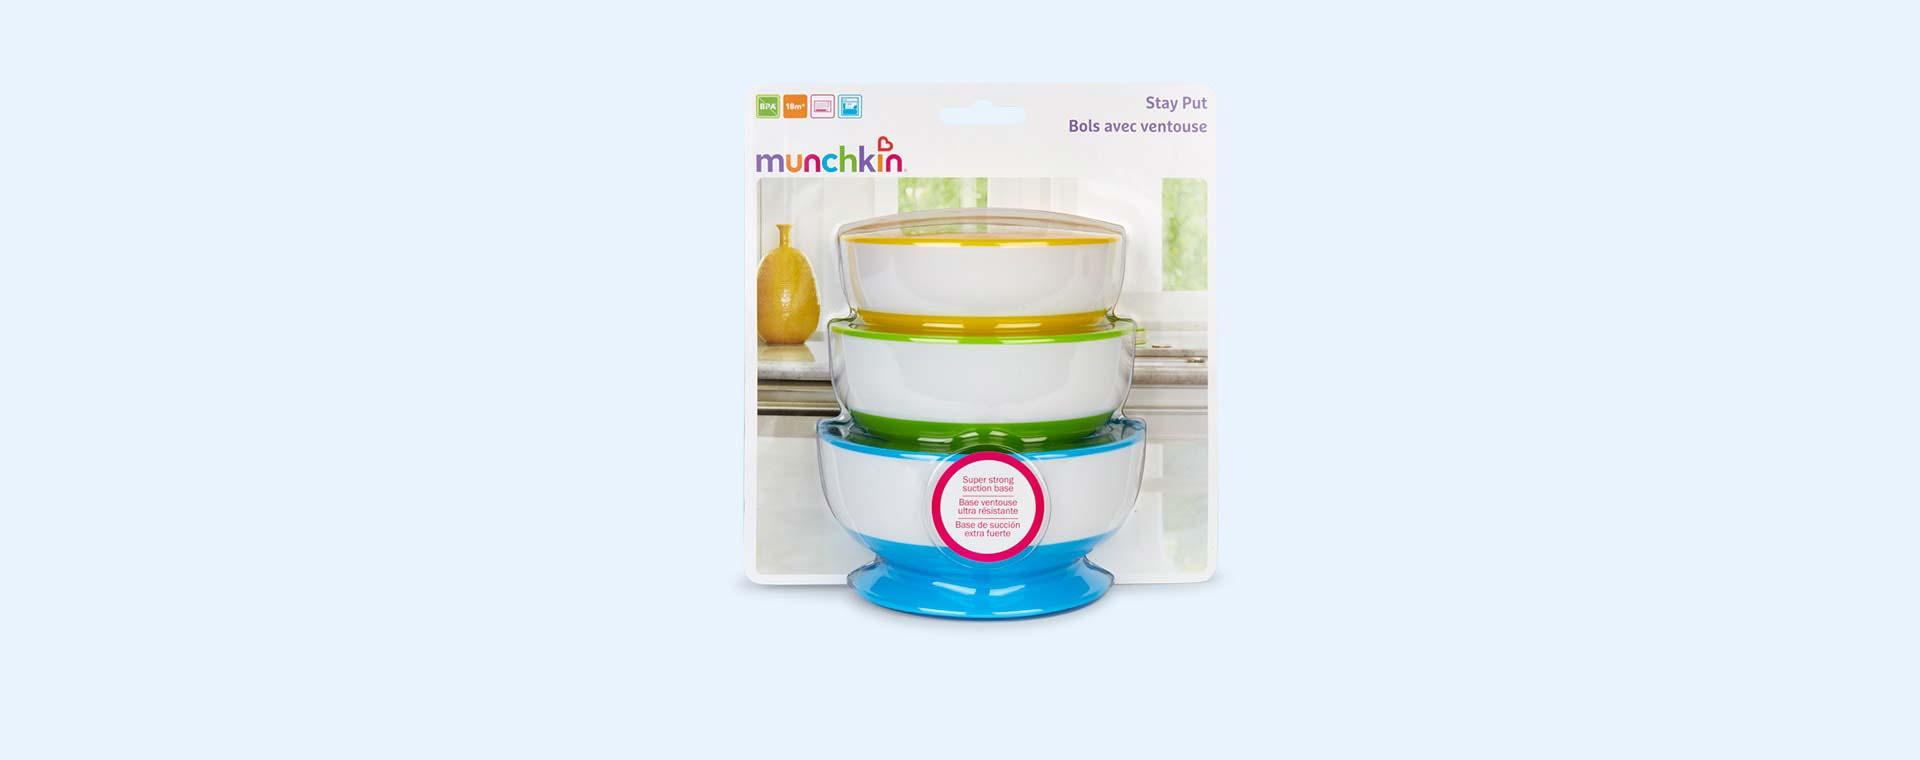 Multi Munchkin Stay Put Suction Bowls 3 pack